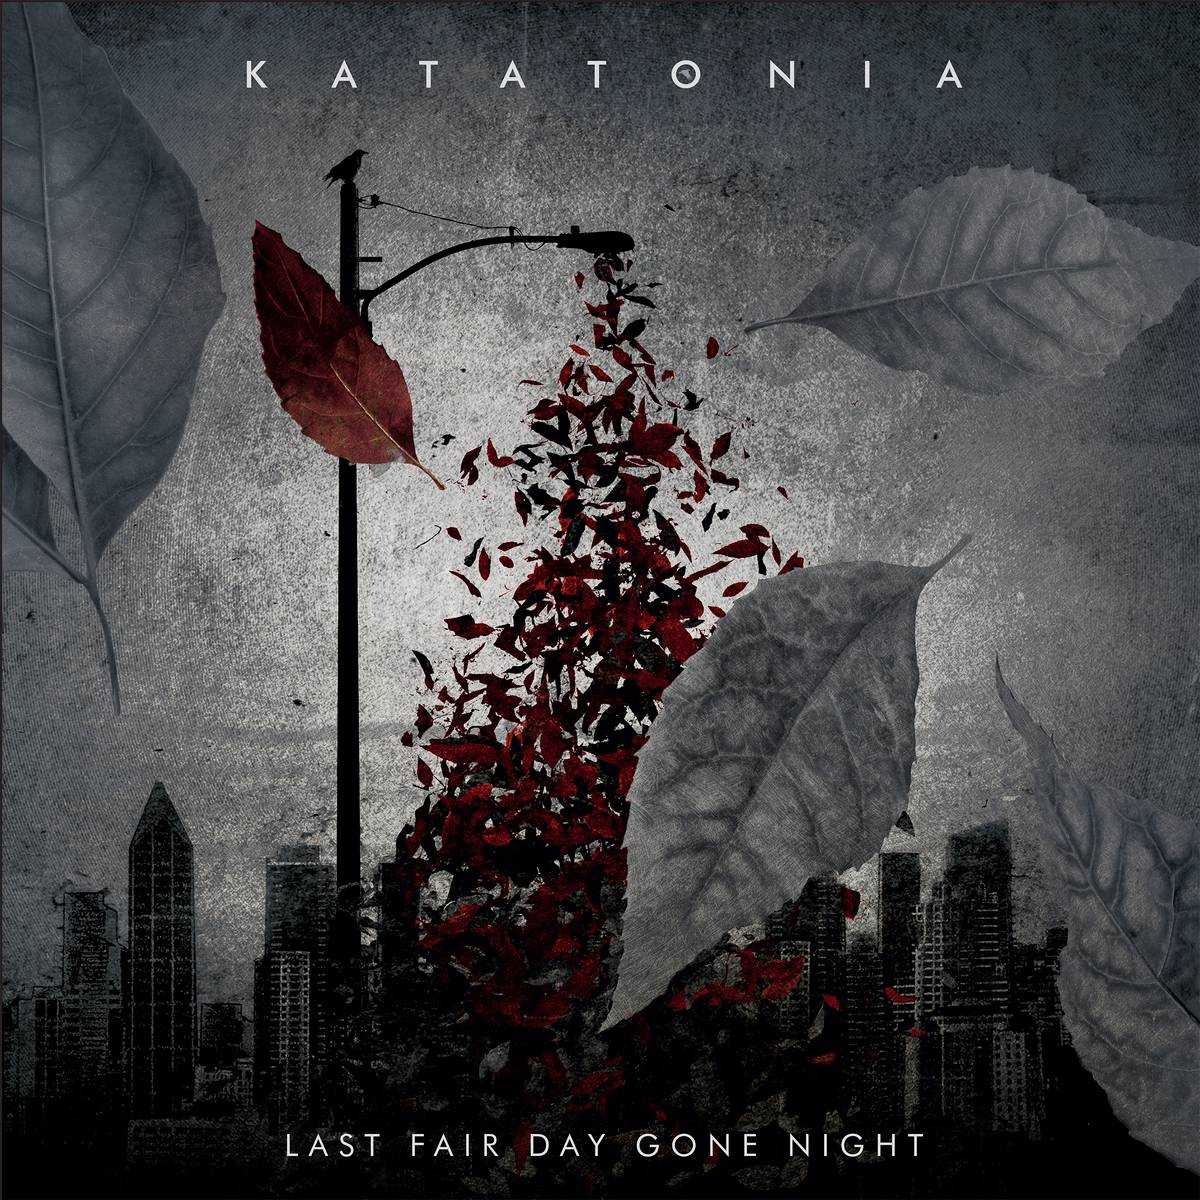 Katatonia: Last Fair Day Gone Night (2014) Book Cover